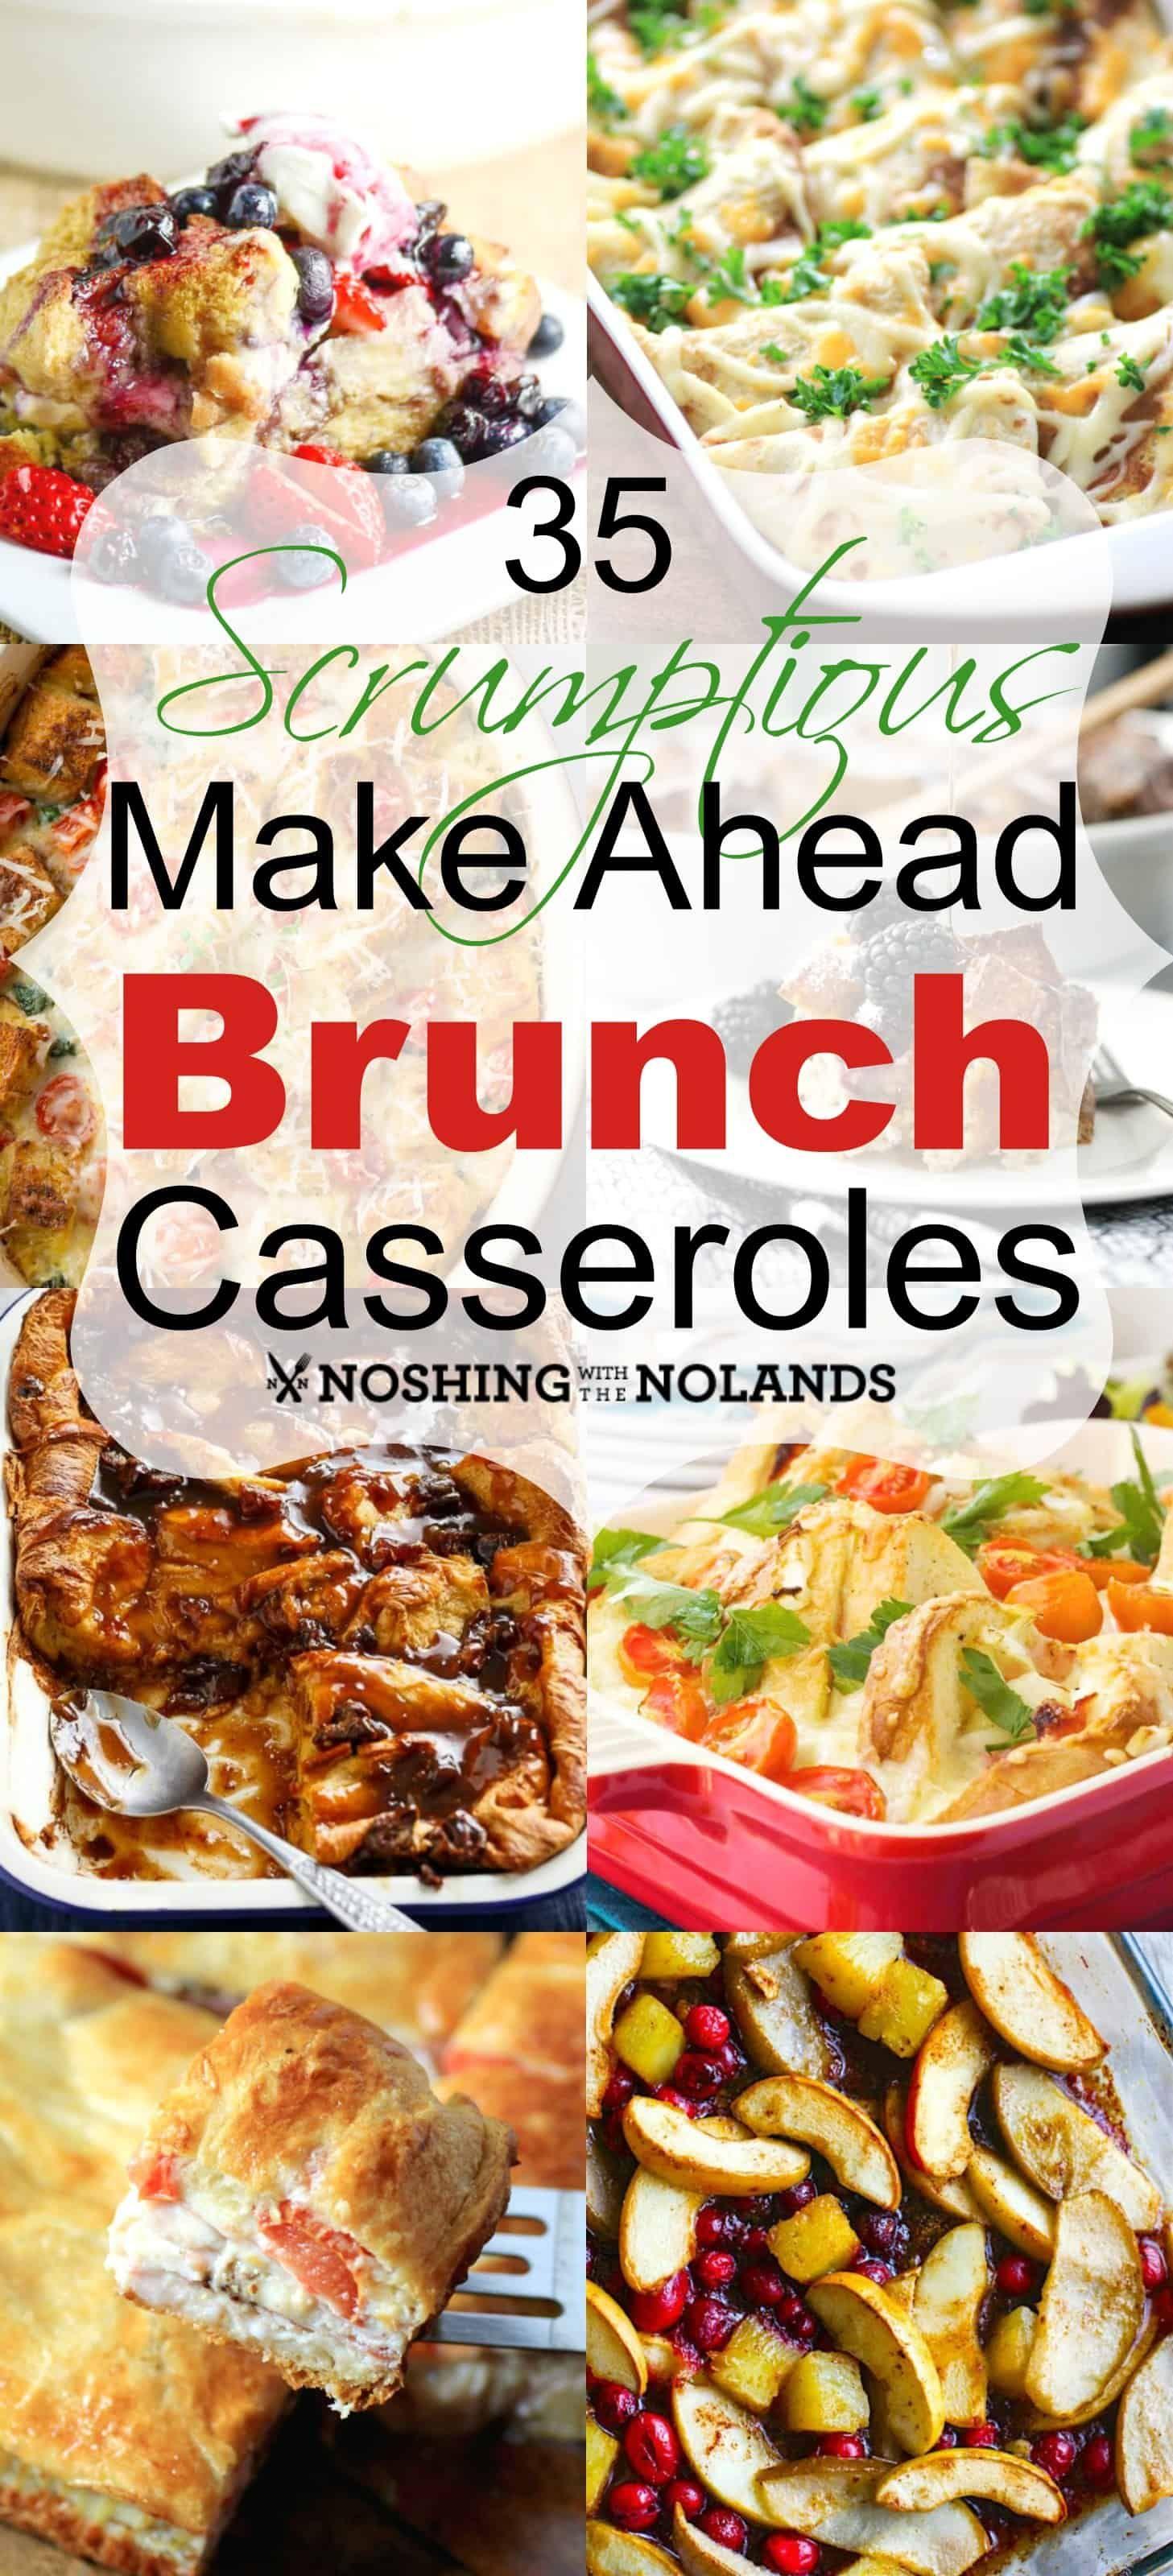 35 Scrumptious Make Ahead Brunch Casseroles #frühstückundbrunch